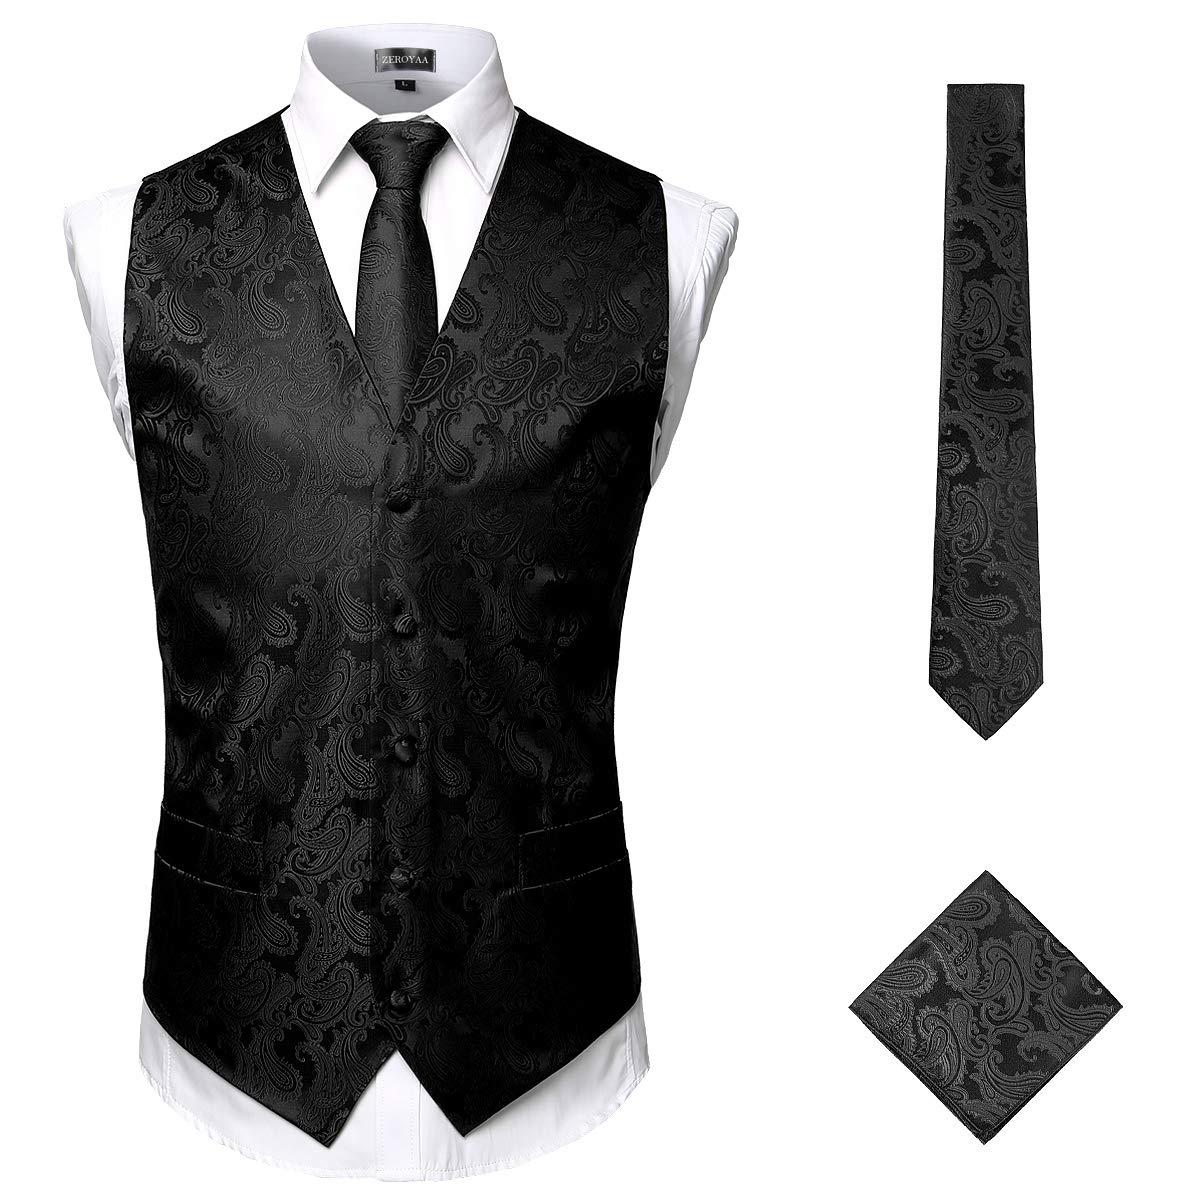 ZEROYAA Men's 3pc Paisley Jacquard Vest Set Necktie Pocket Square Set for Suit or Tuxedo ZLSV14 Black Medium by ZEROYAA